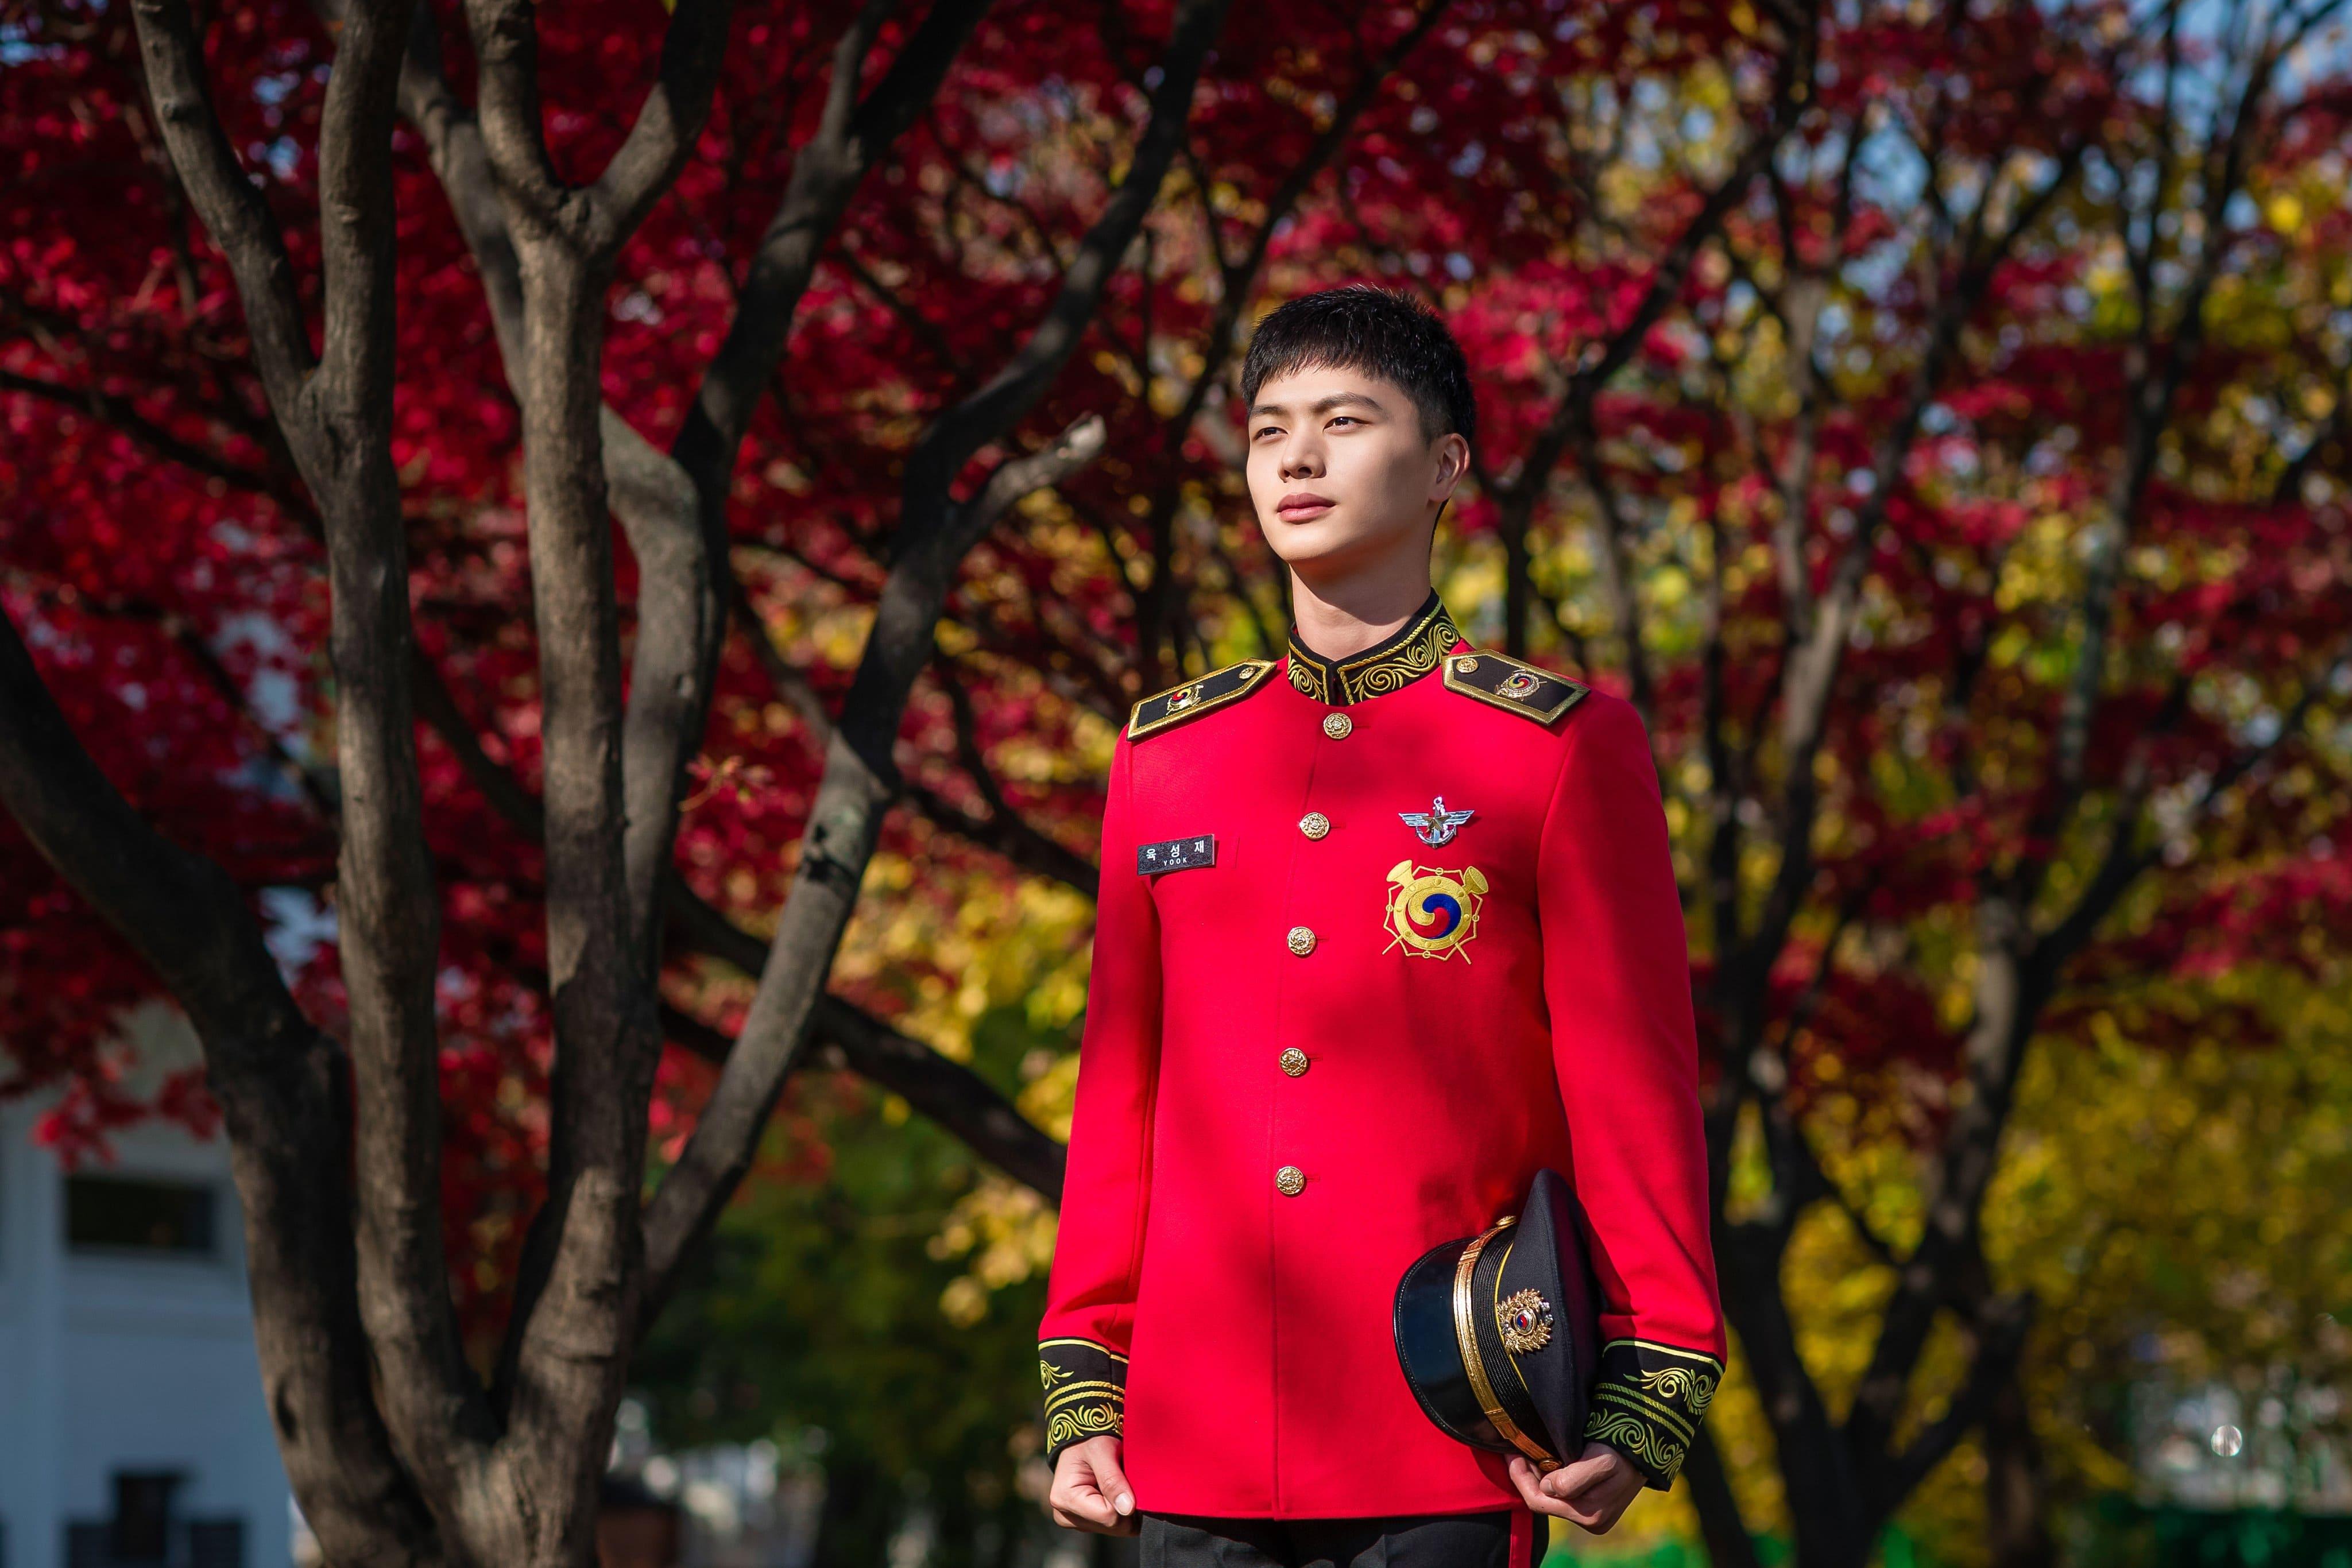 yook sungjae 31 - Militer Ungkap Foto Baru D.O. EXO Dan Yook Sungjae BTOB